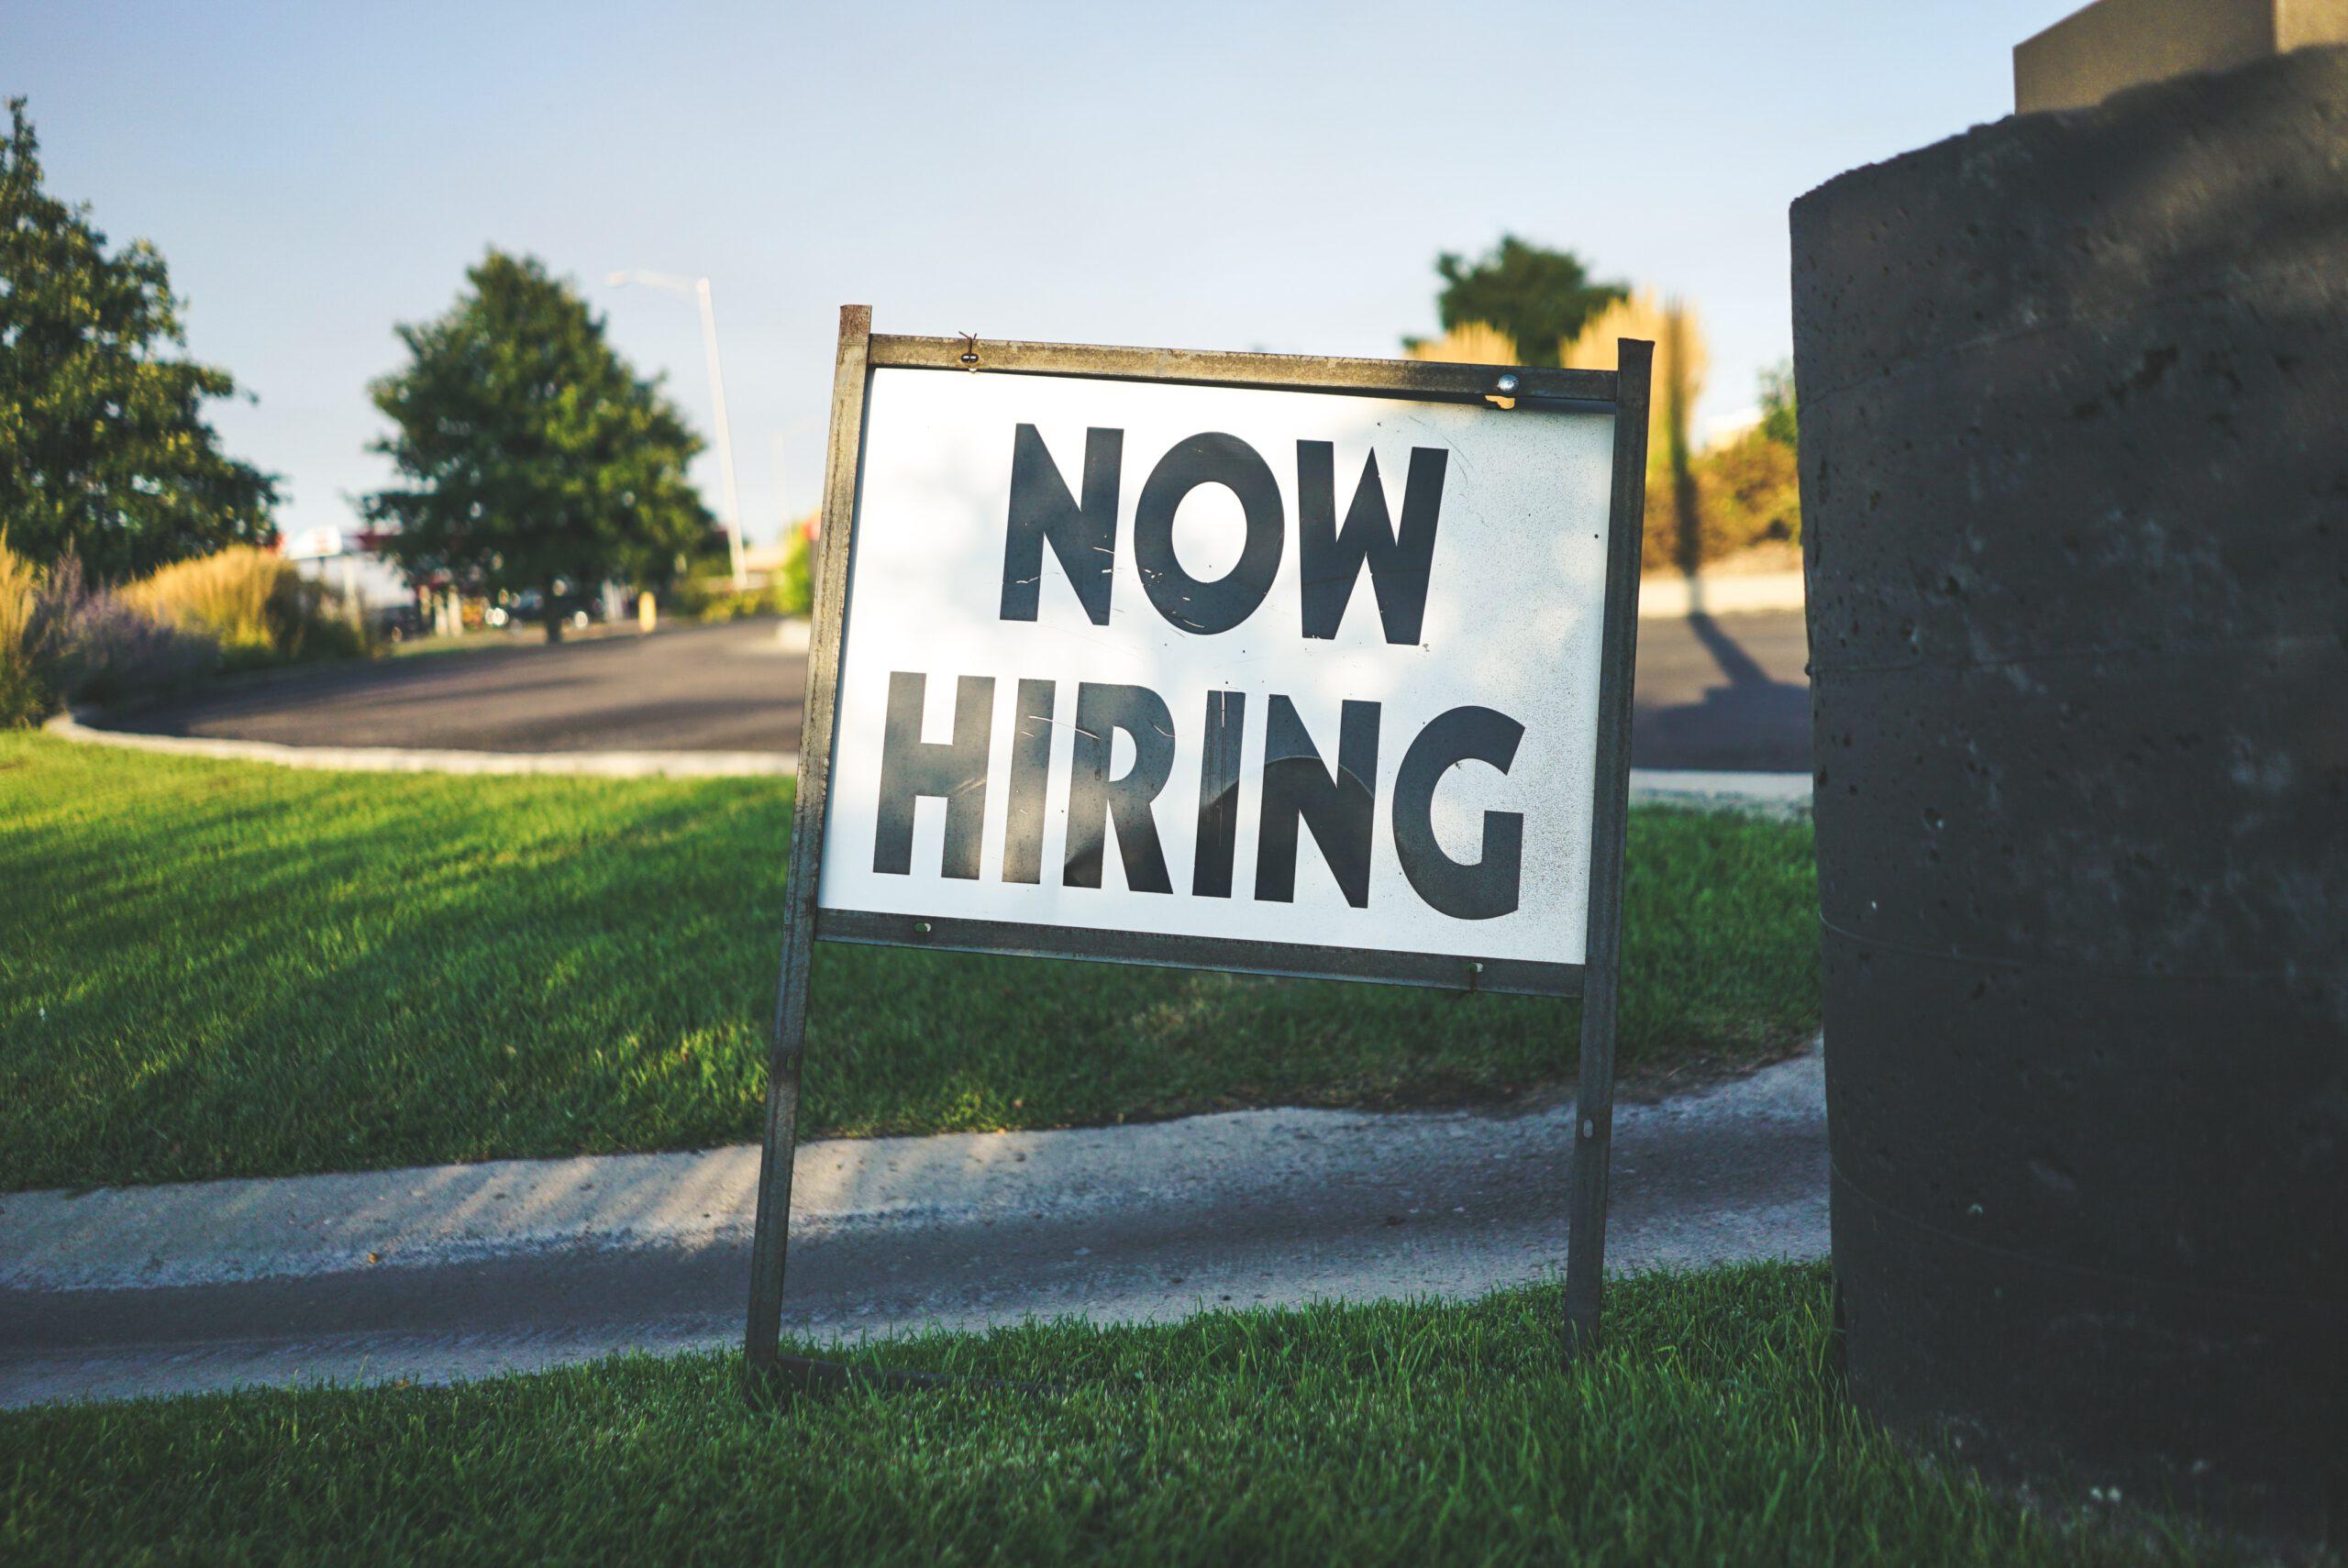 How hiring Sign